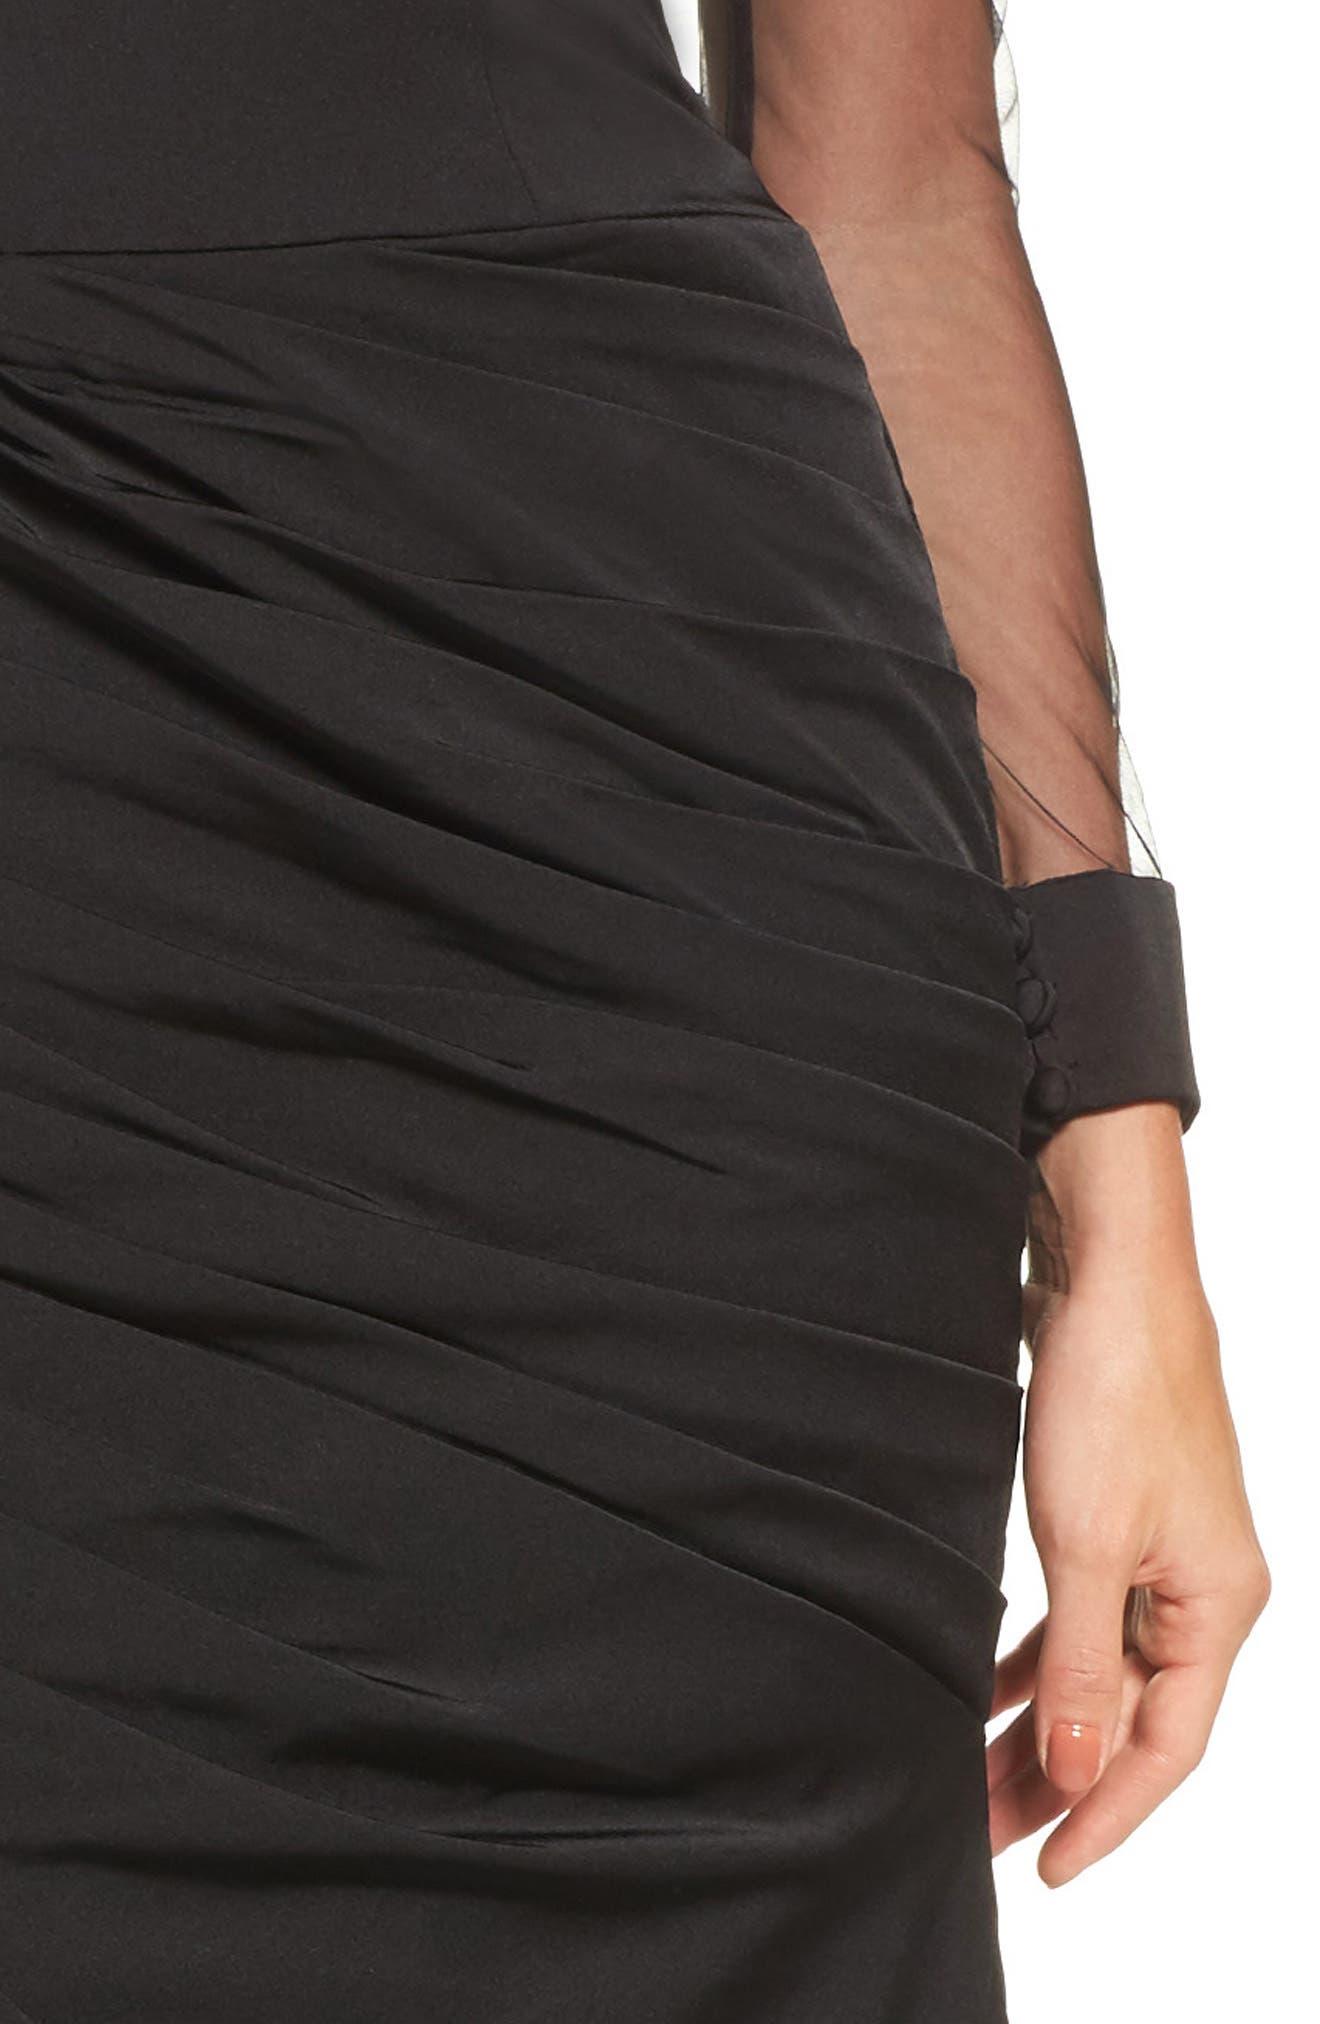 LA FEMME, Sheer Sleeve Gown, Alternate thumbnail 4, color, BLACK